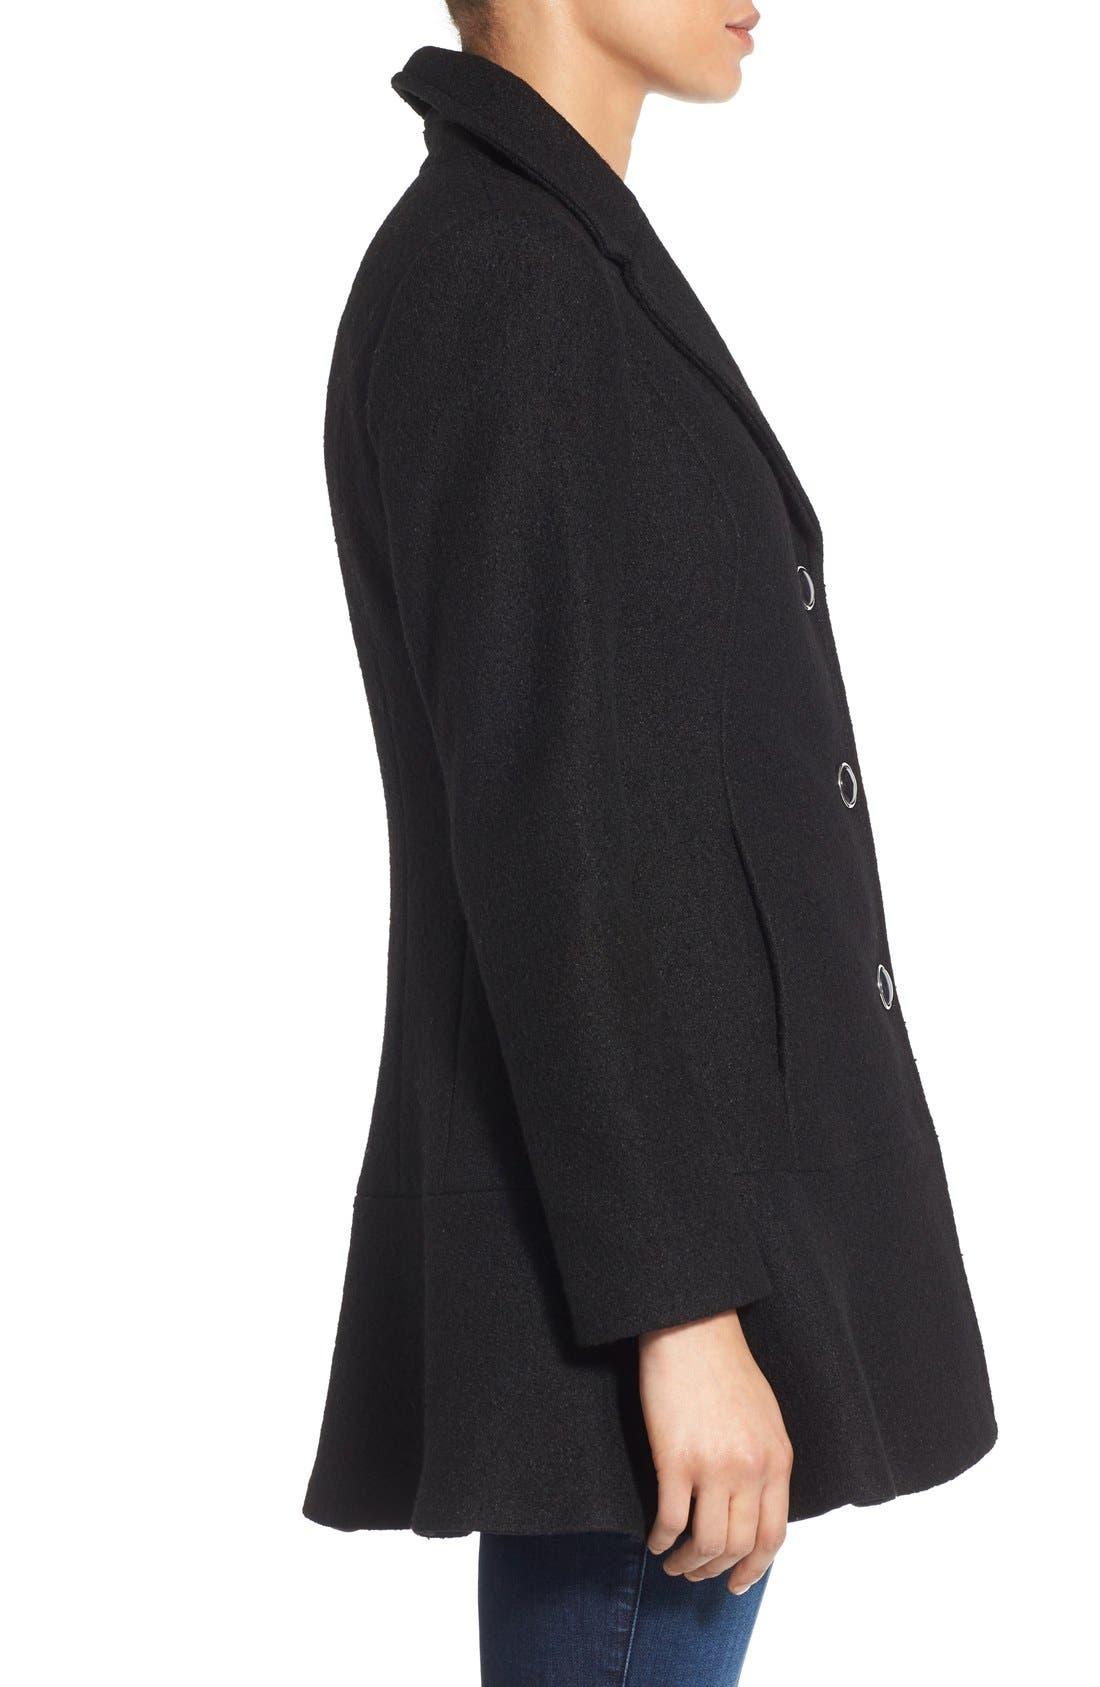 Notch Lapel Peplum Coat,                             Alternate thumbnail 3, color,                             Black